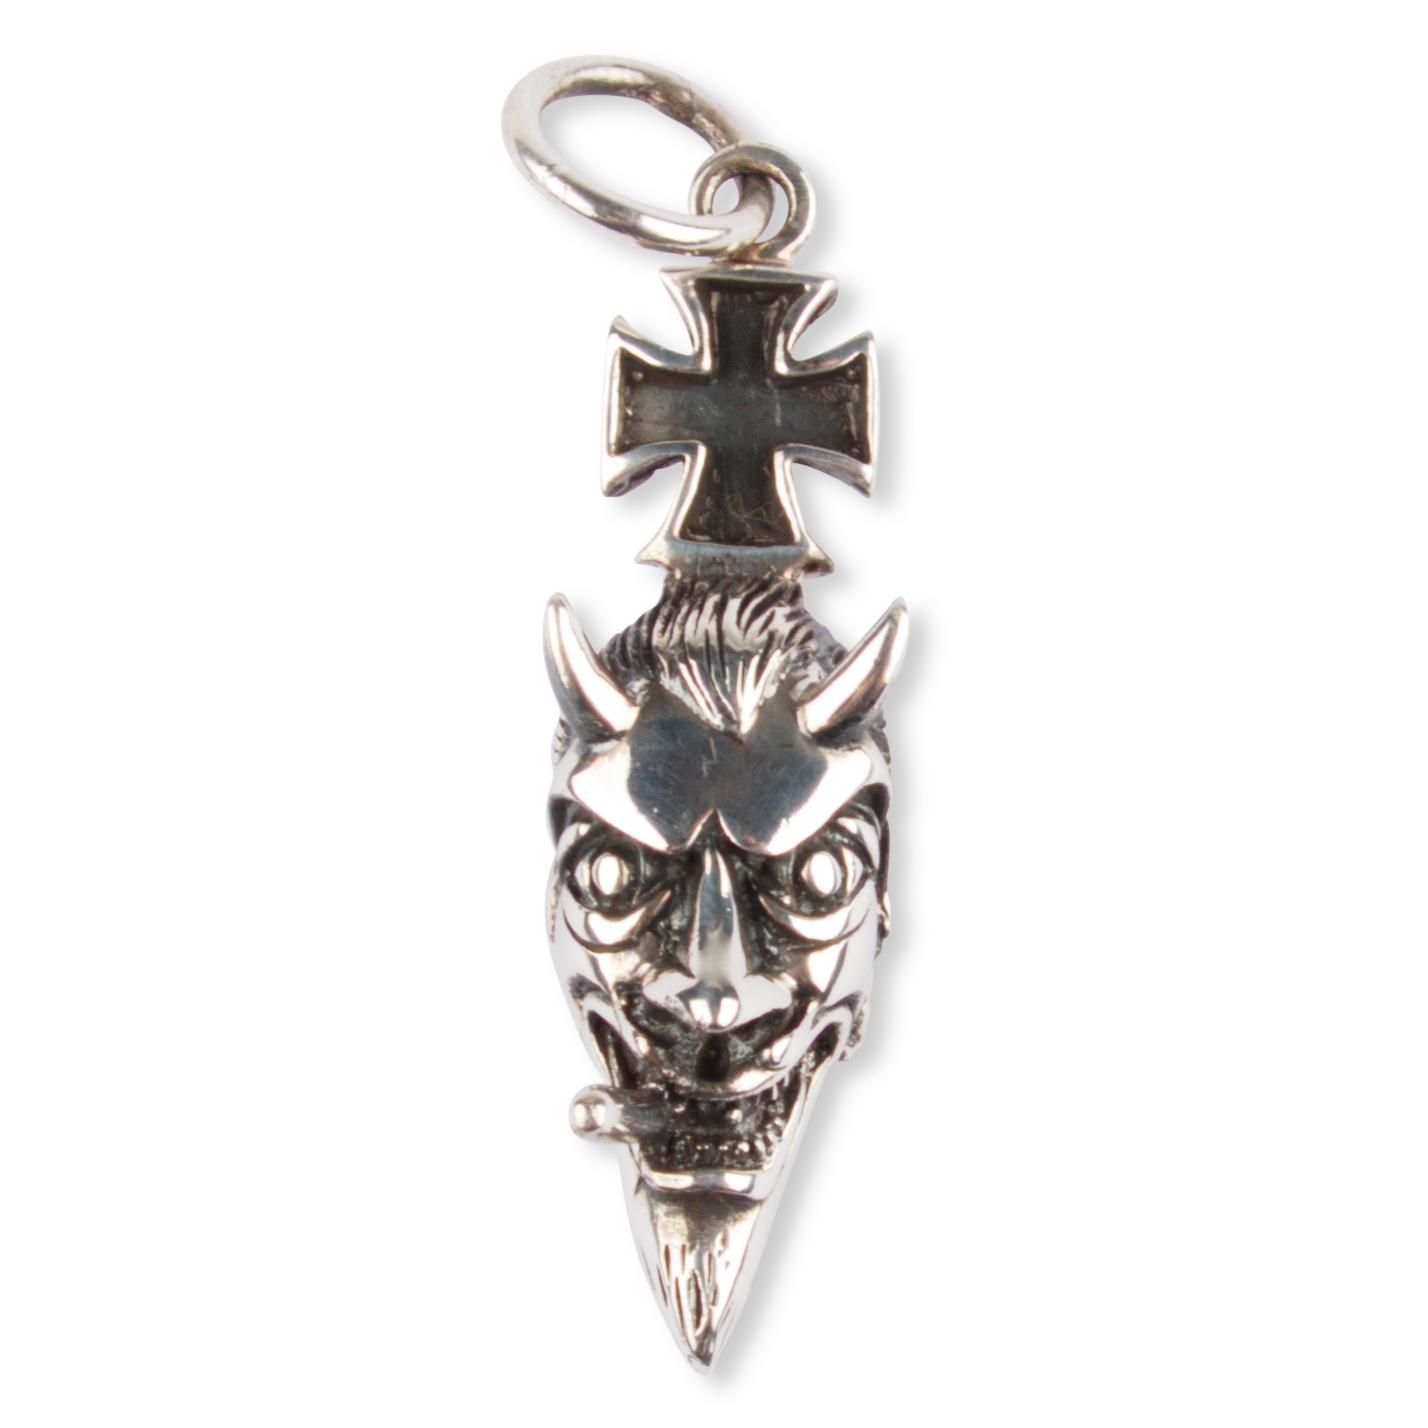 Beelzebub Necklace